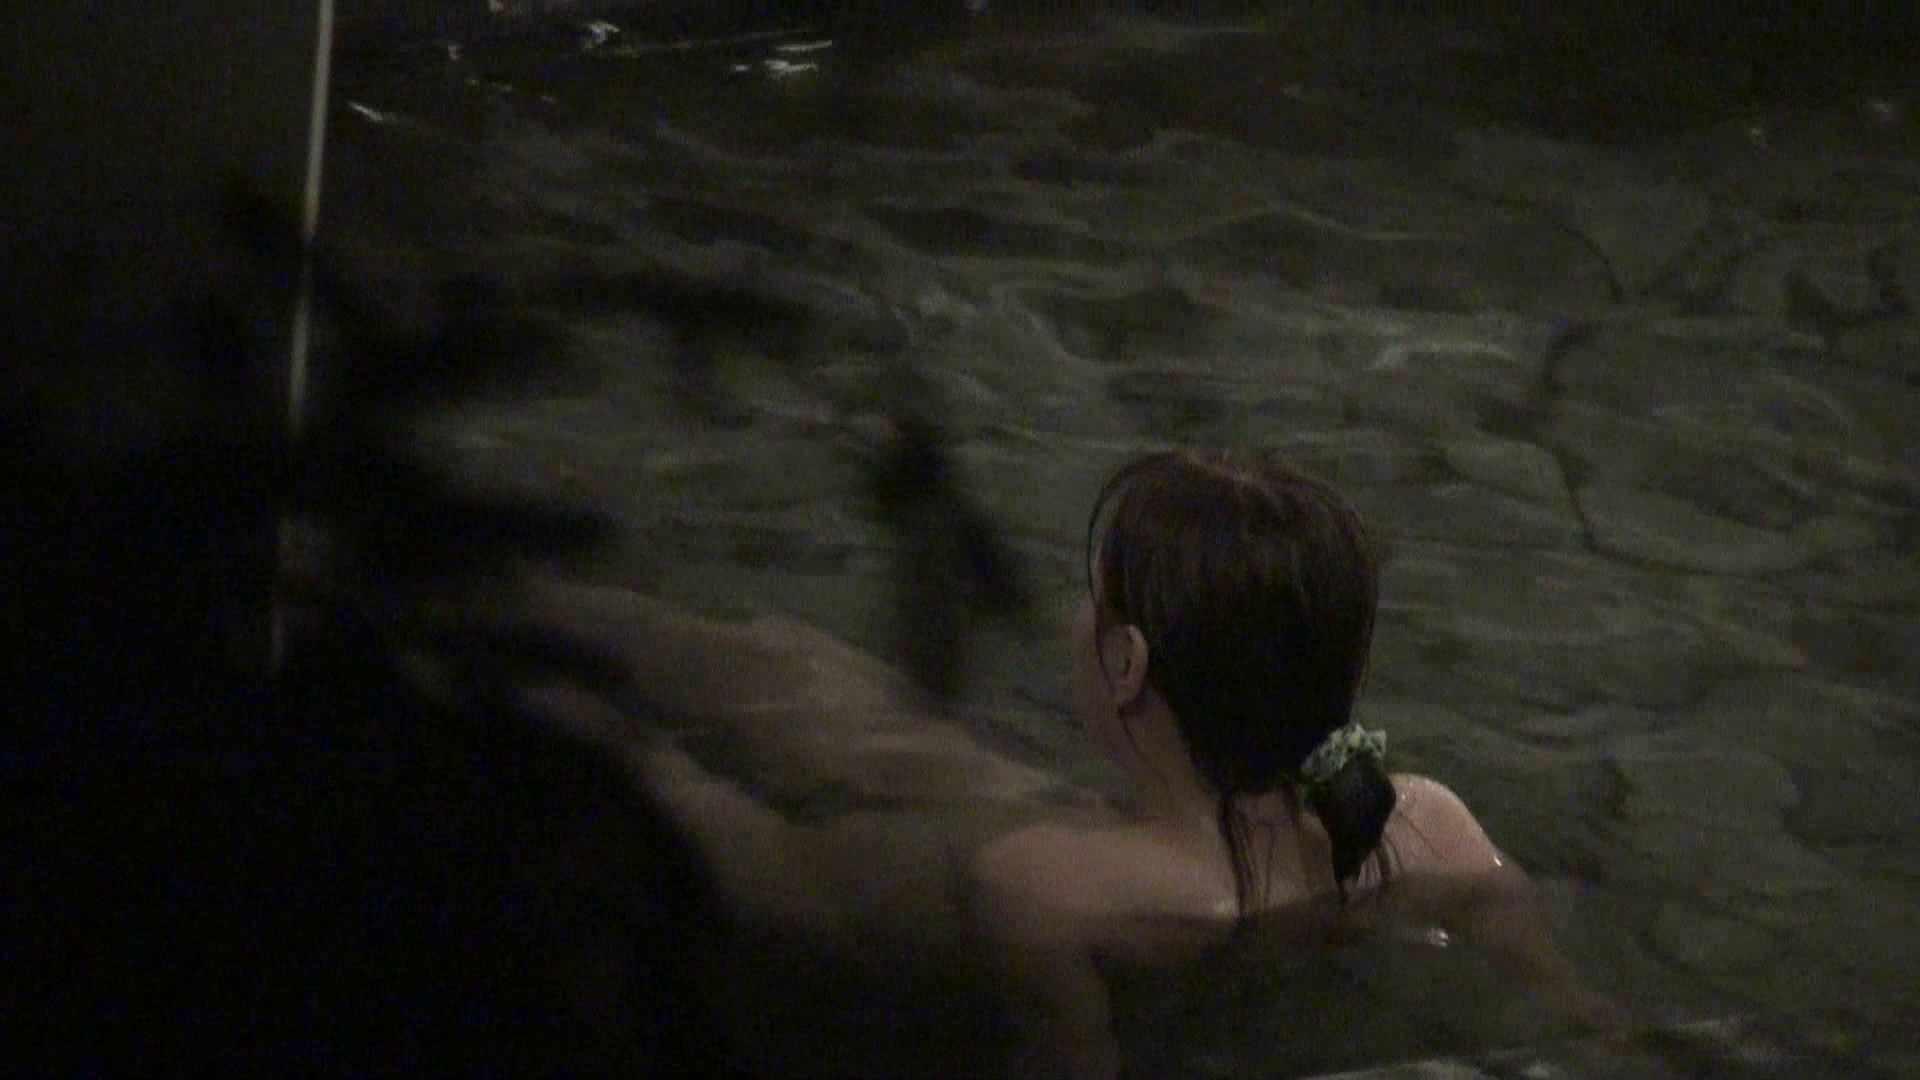 Aquaな露天風呂Vol.438 0  65連発 6